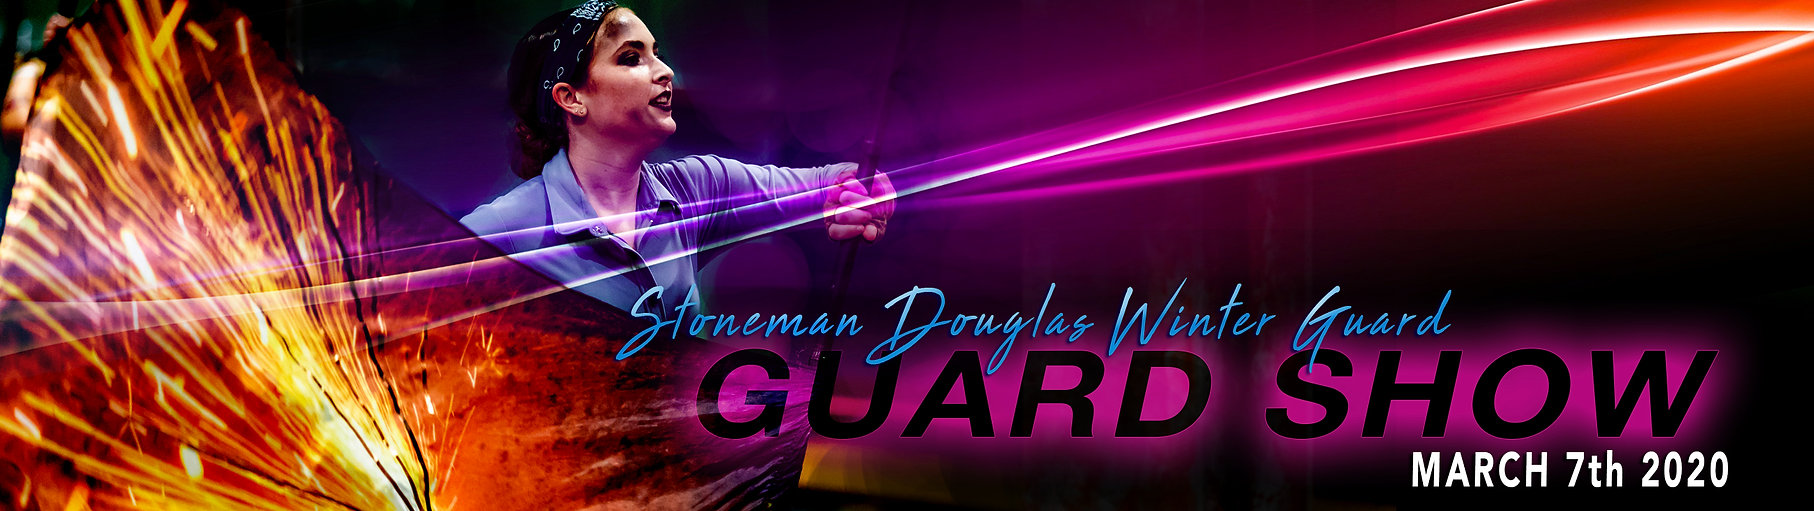 Banner-Guardshow.jpg